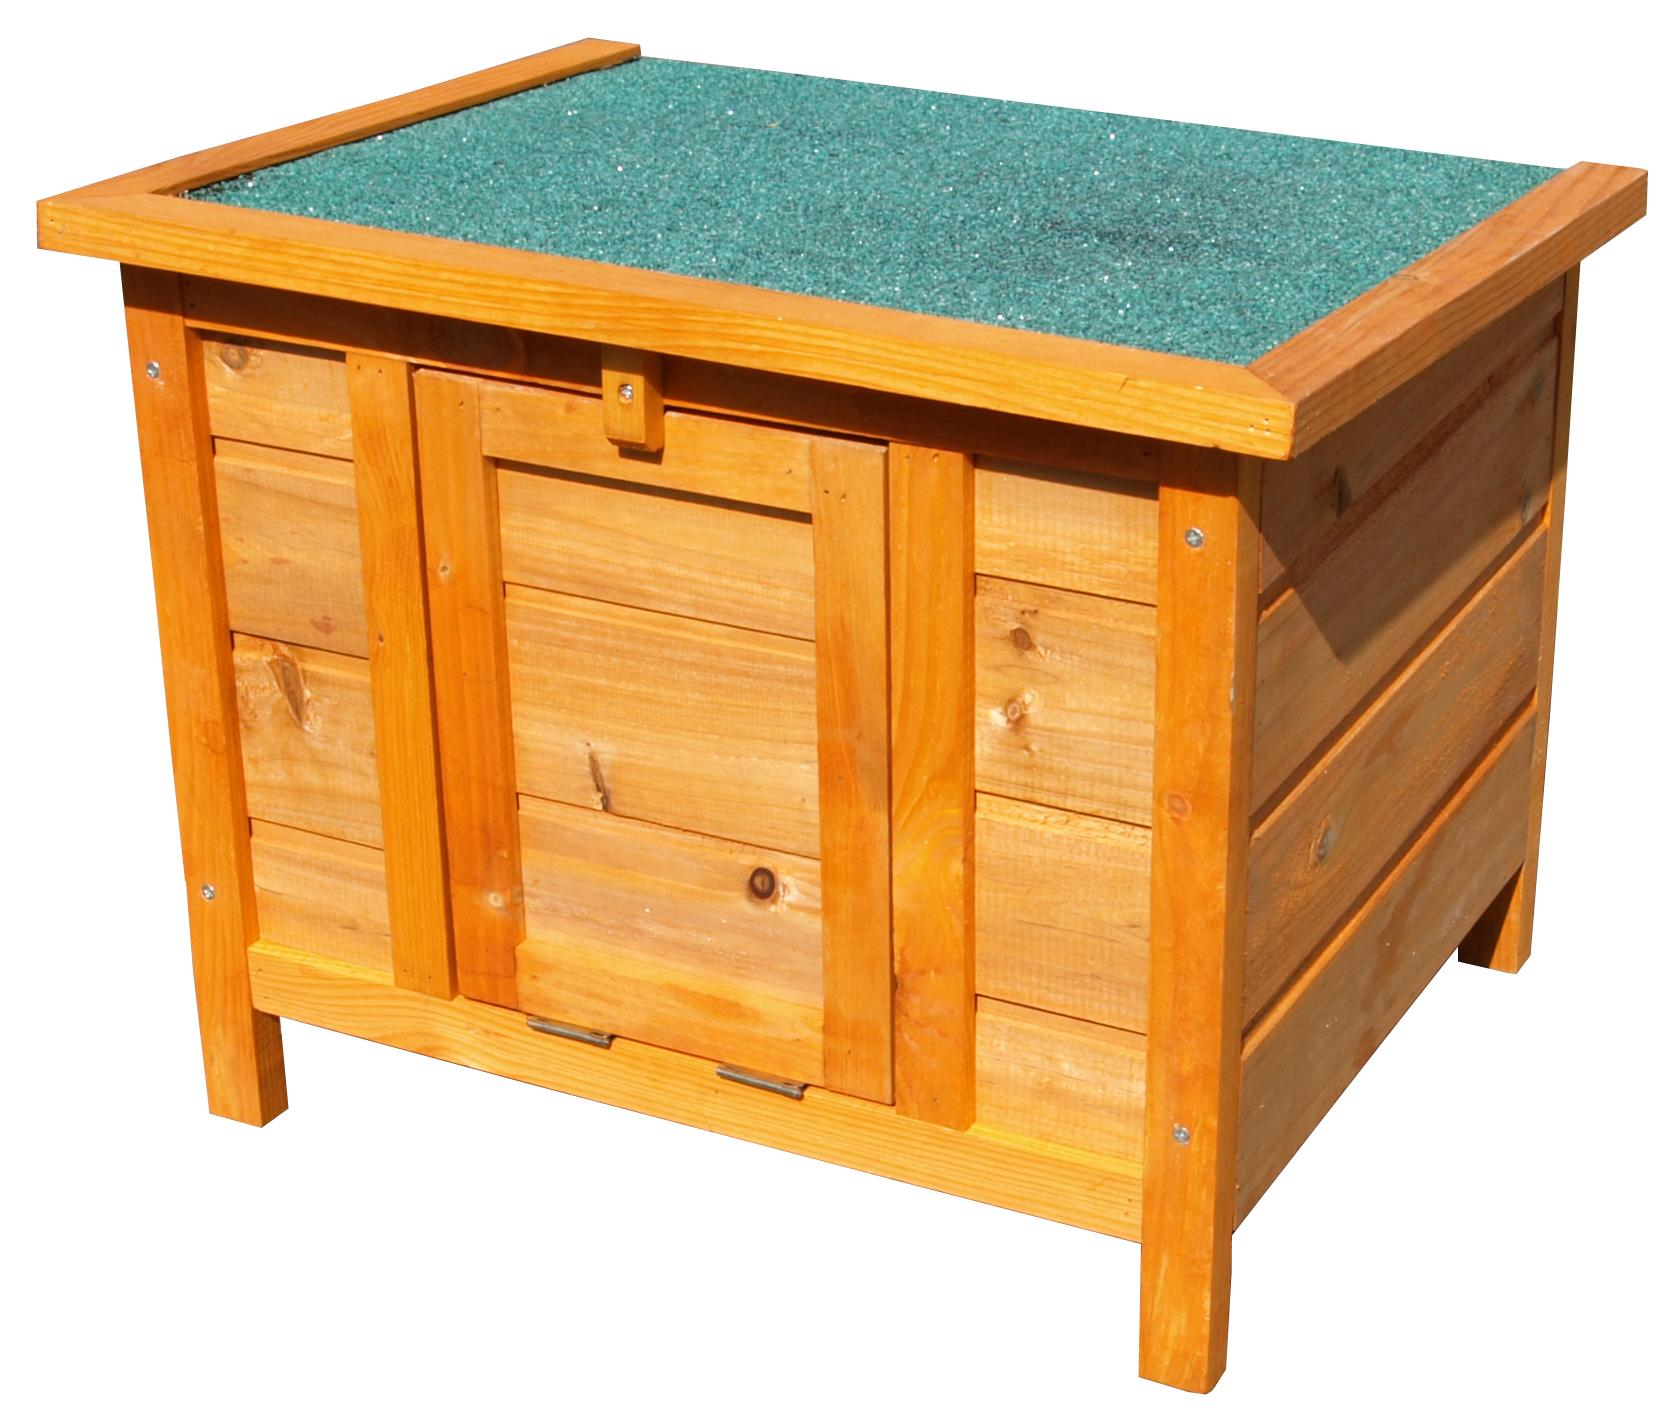 nagerhaus kleintierhaus casita ideal f r freigehege. Black Bedroom Furniture Sets. Home Design Ideas